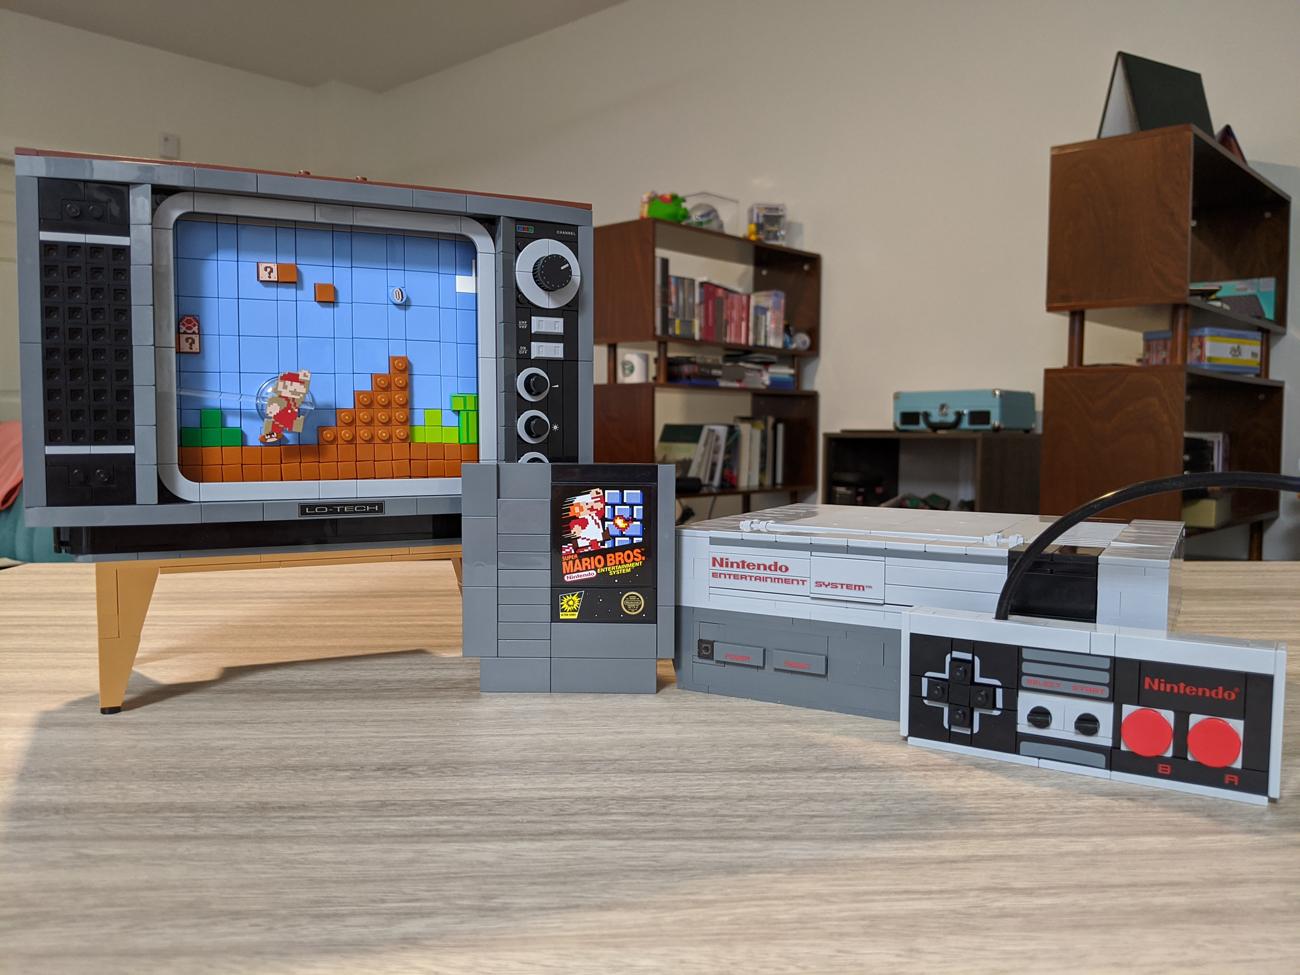 Got five minutes? Watch us put together the LEGO NES set screenshot